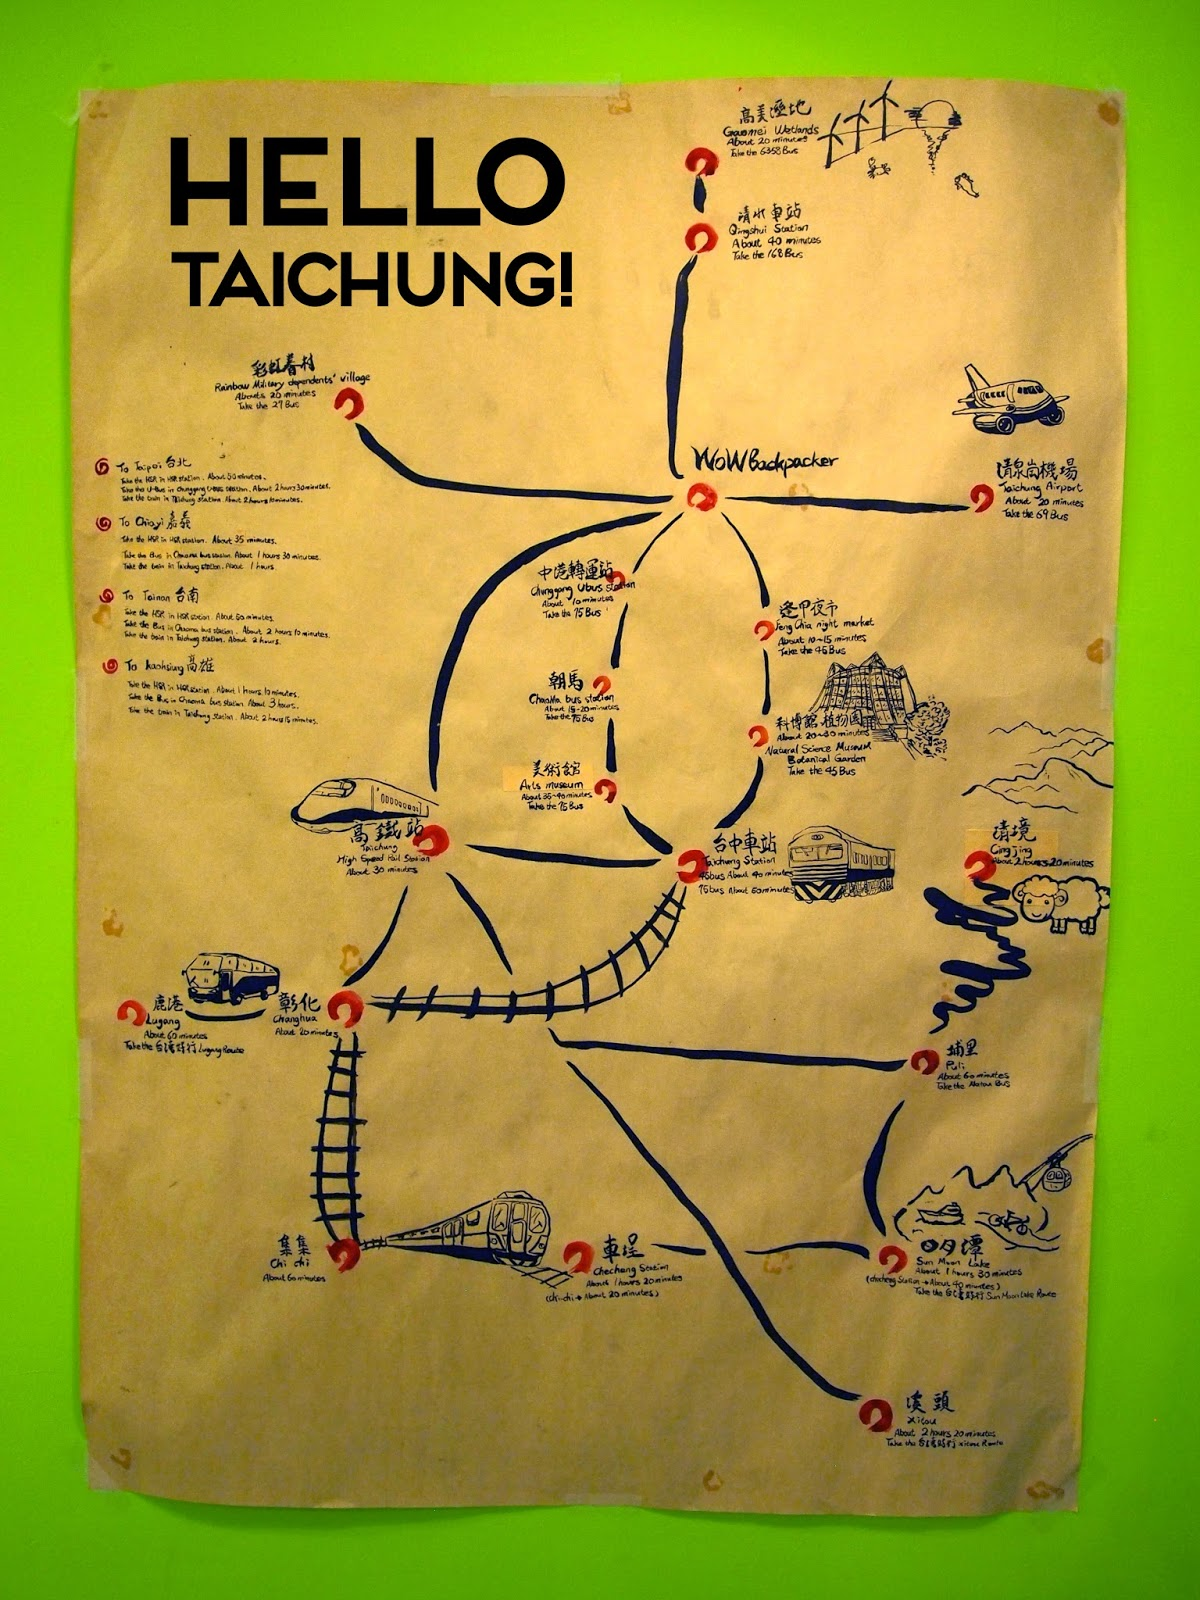 Terrific Taiwan: Let's Go to Taichung!